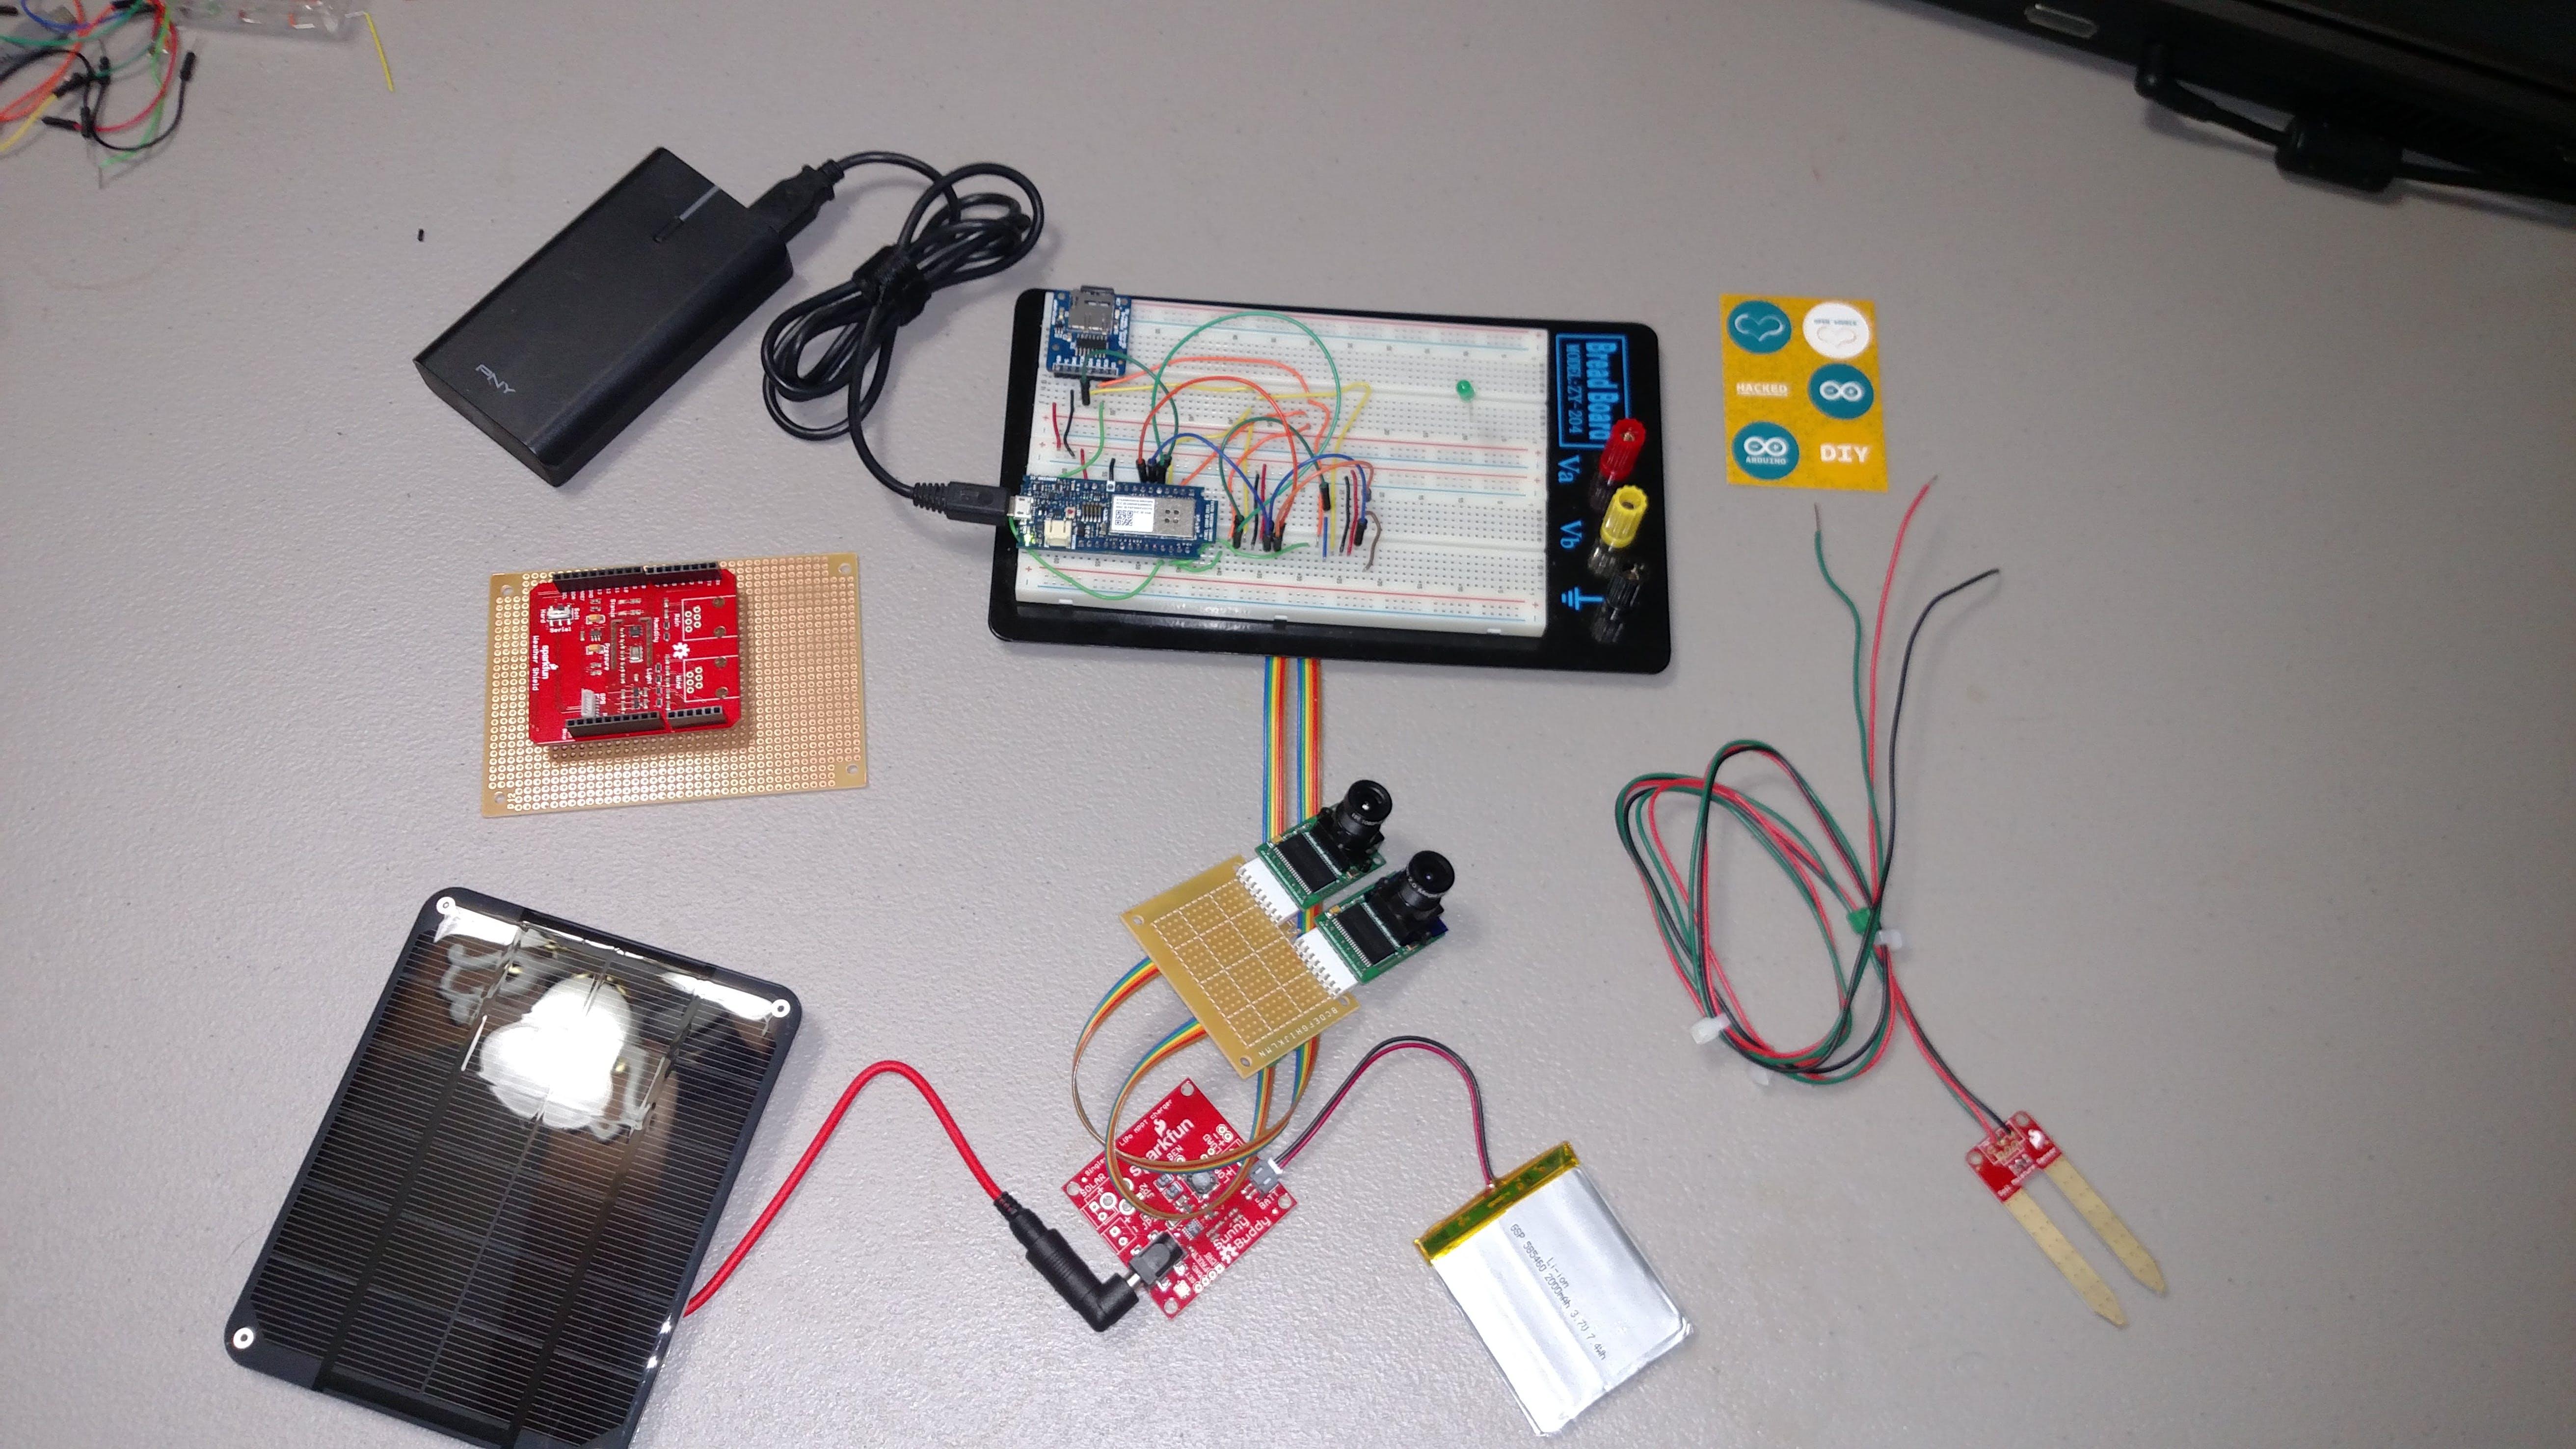 Hardware used for PlantAnalyzer V1.0